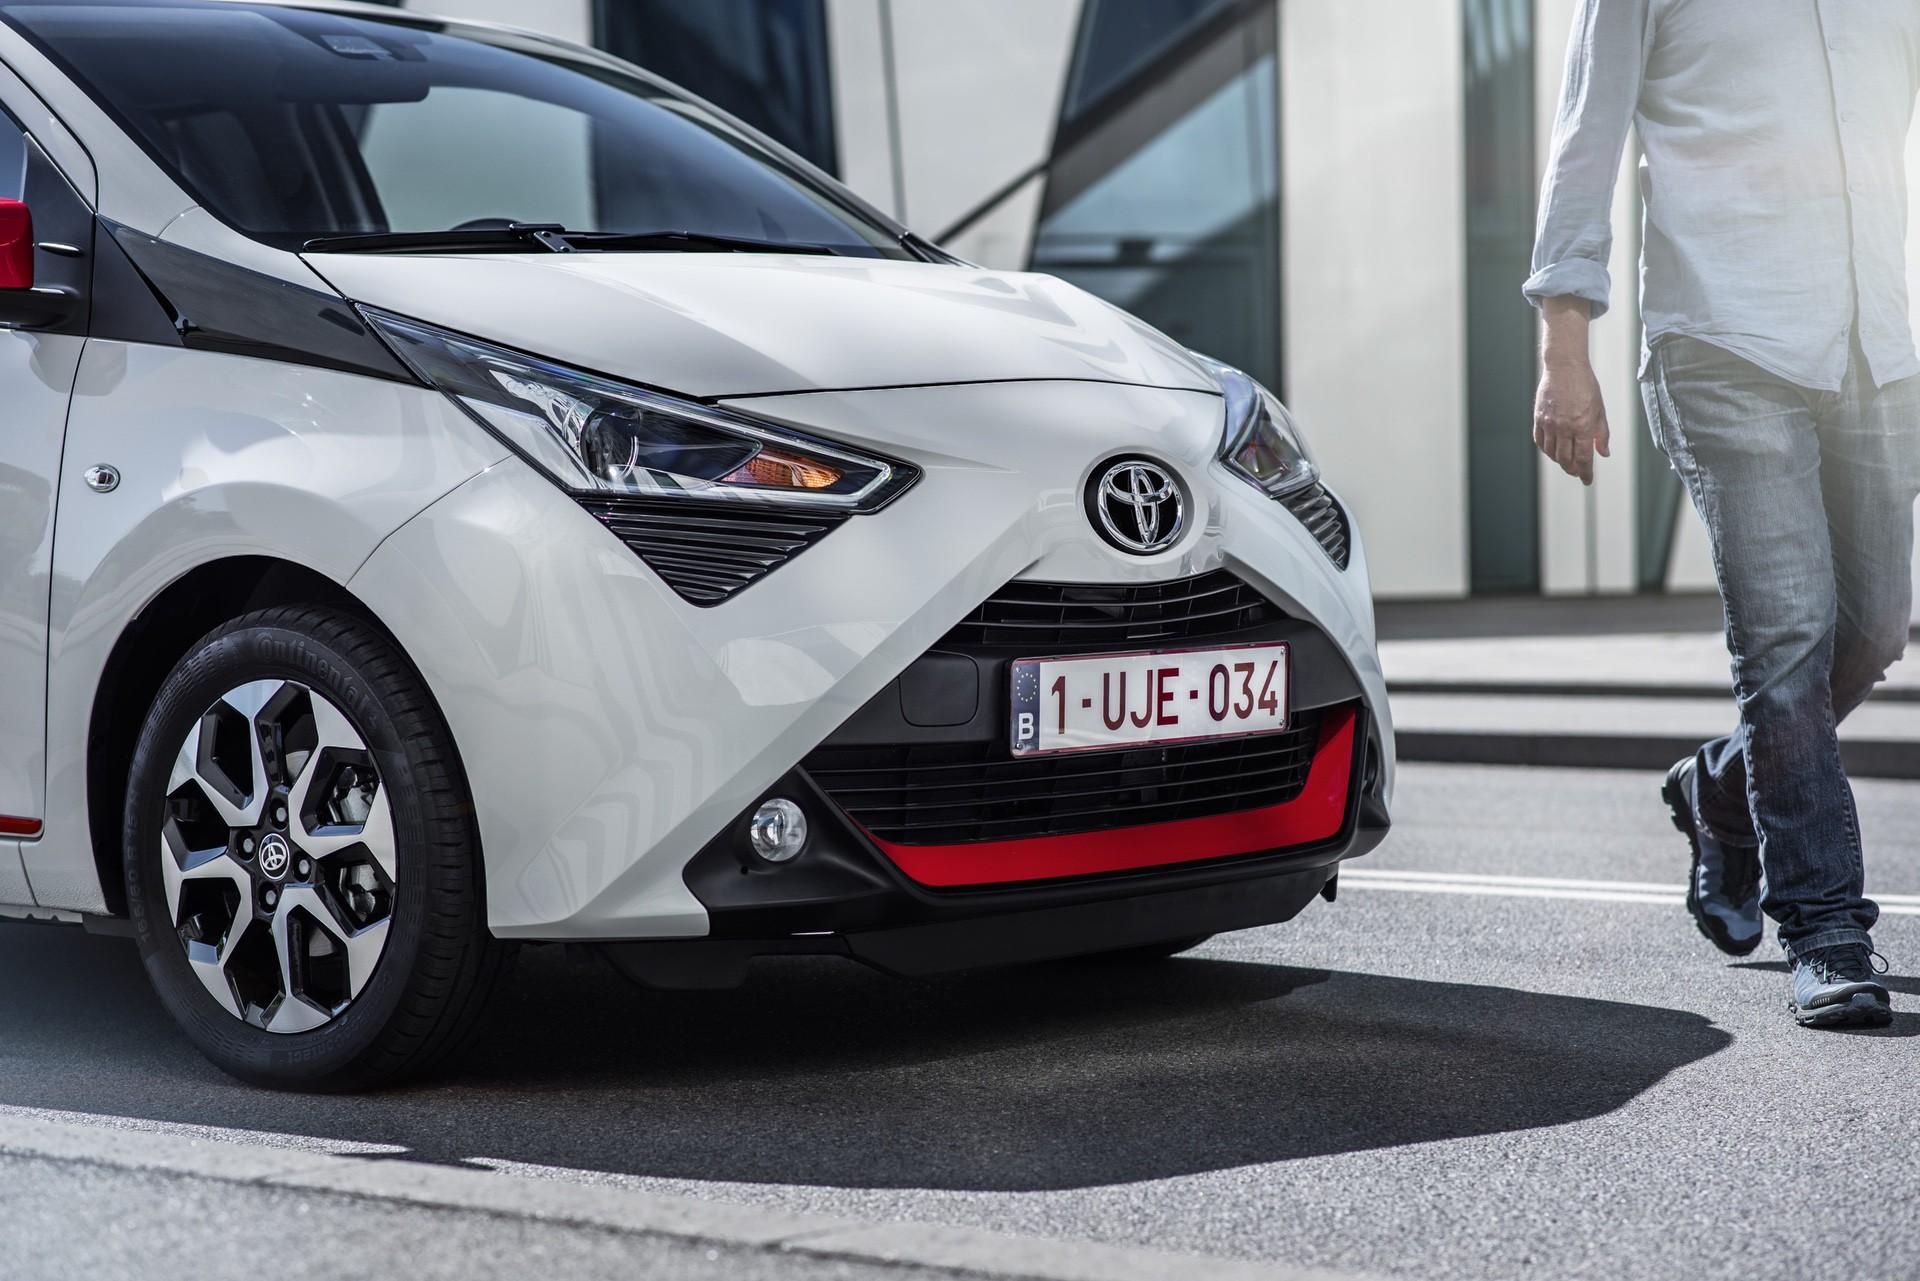 Toyota_Aygo_facelift_presskit_0076